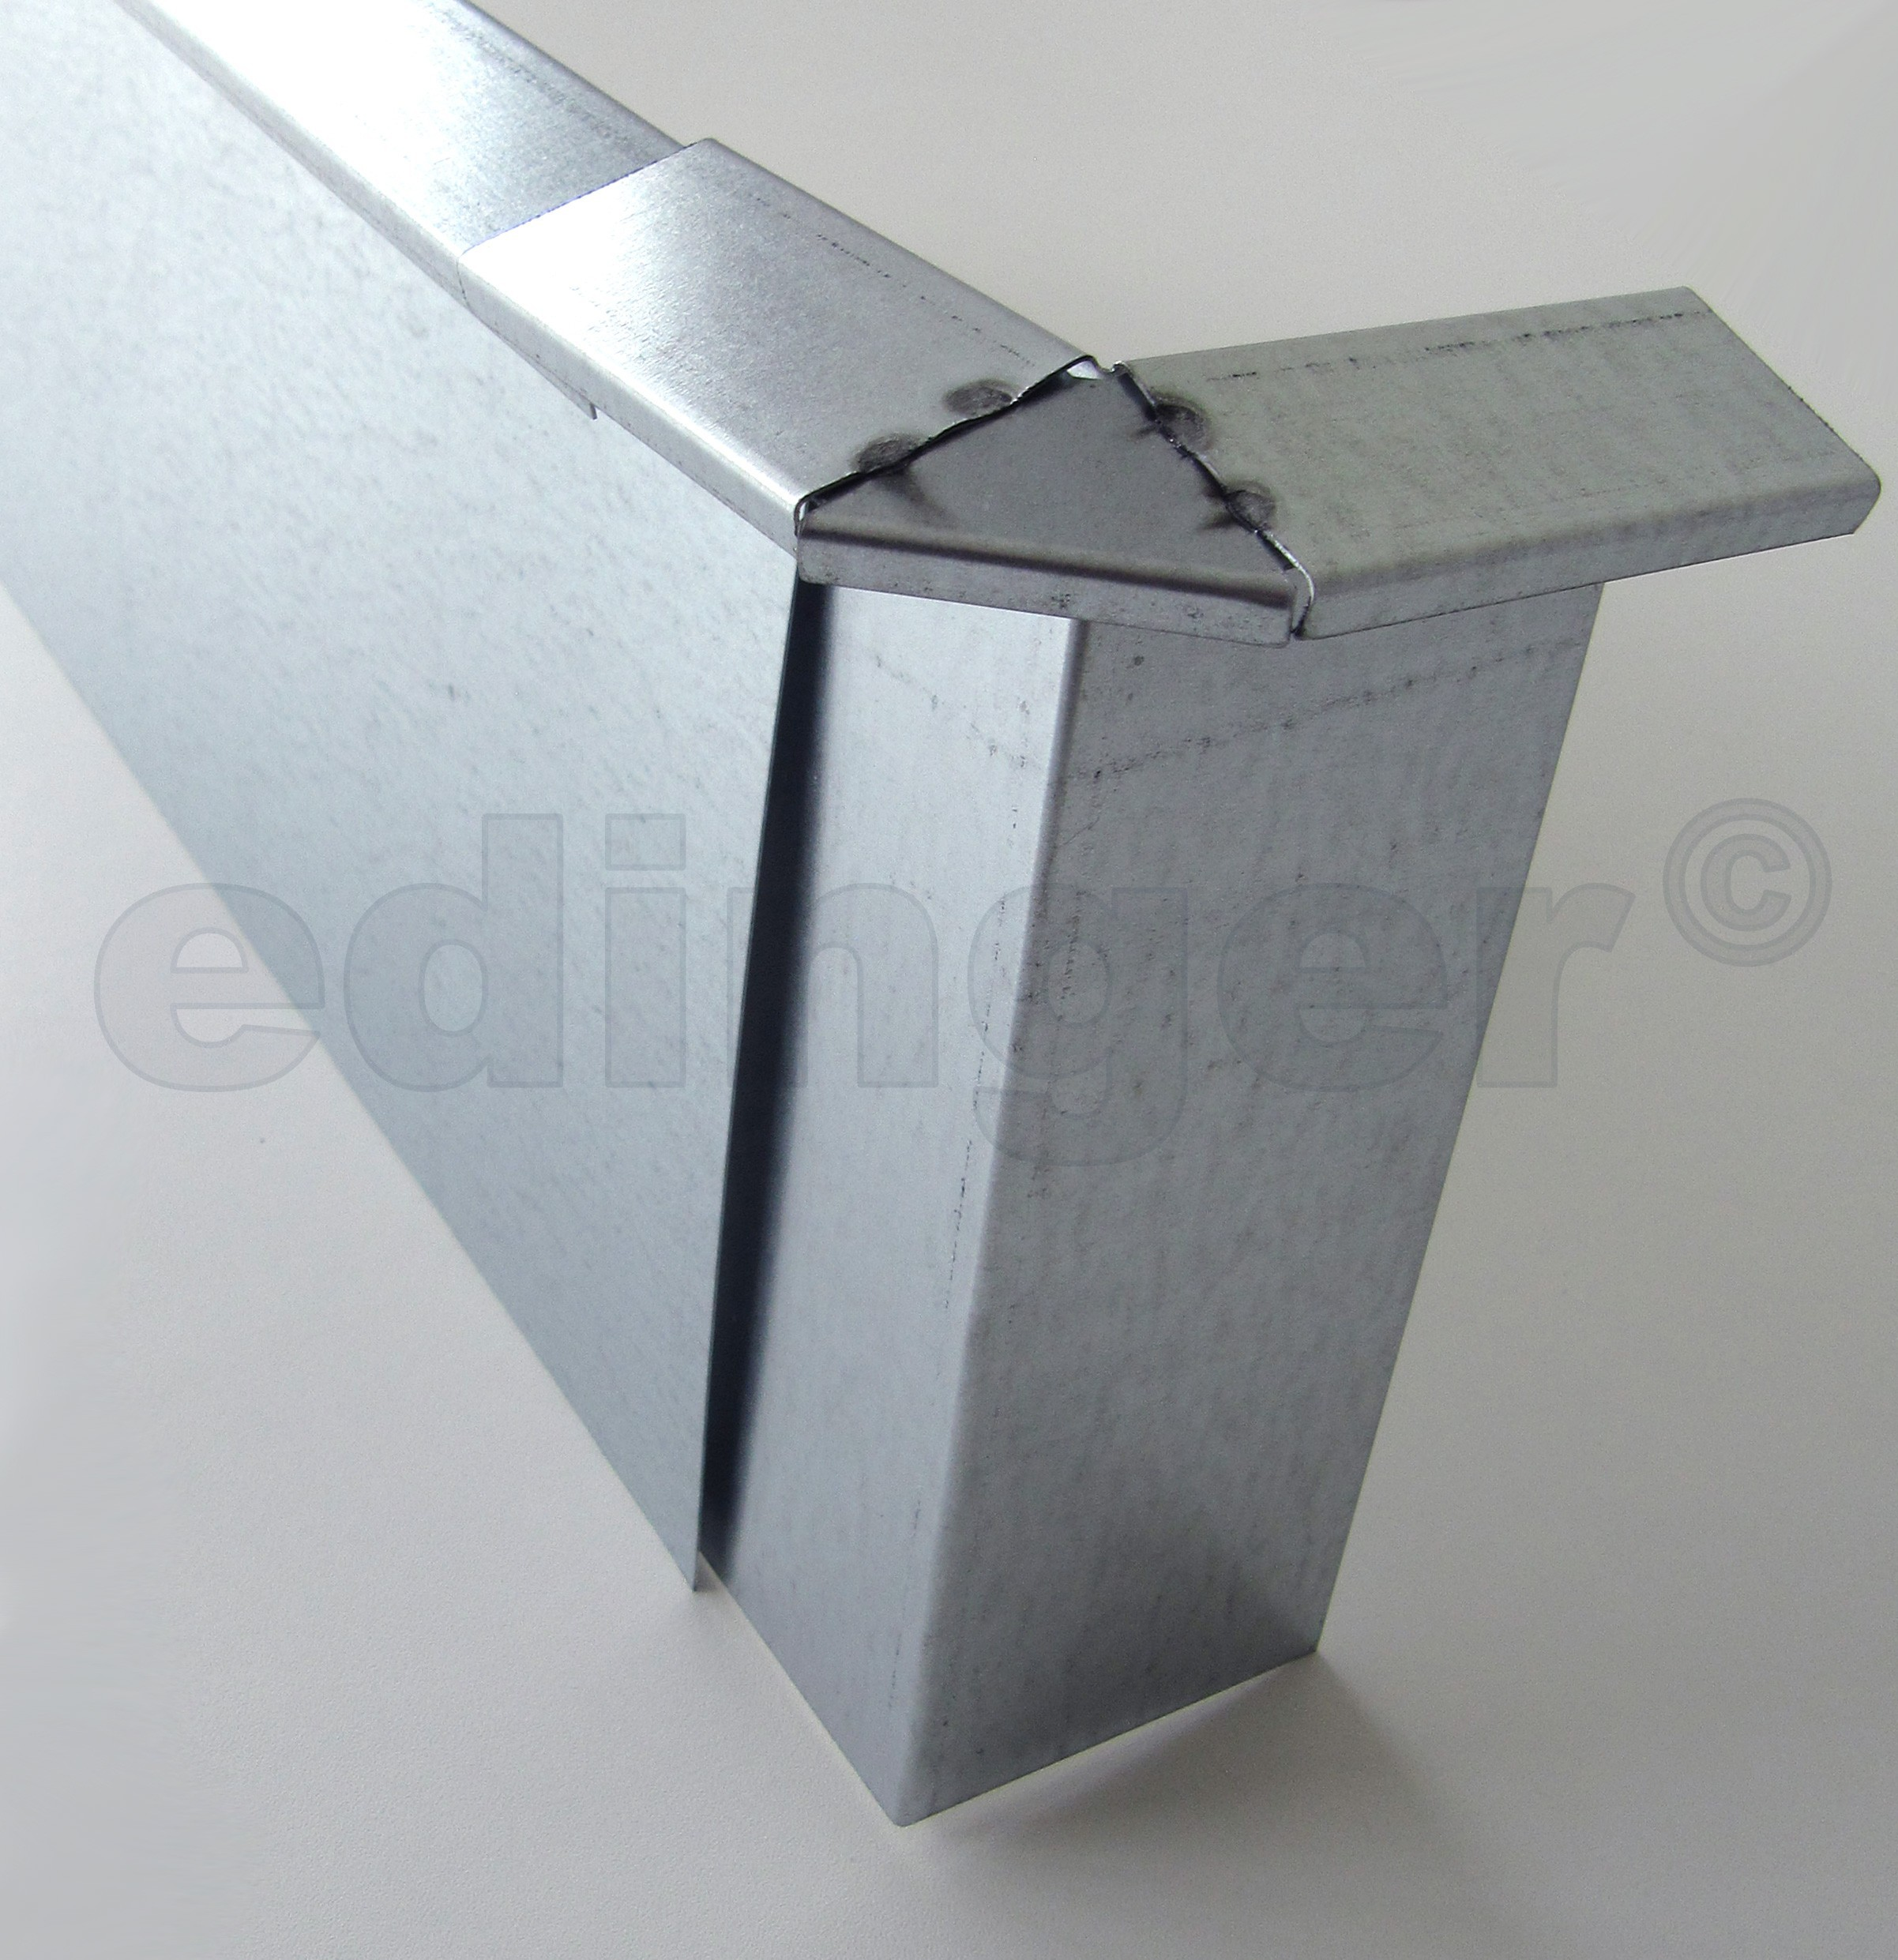 Schneckenzaun / Schneckenblech Metall Eckverbindung 90° Bild 2